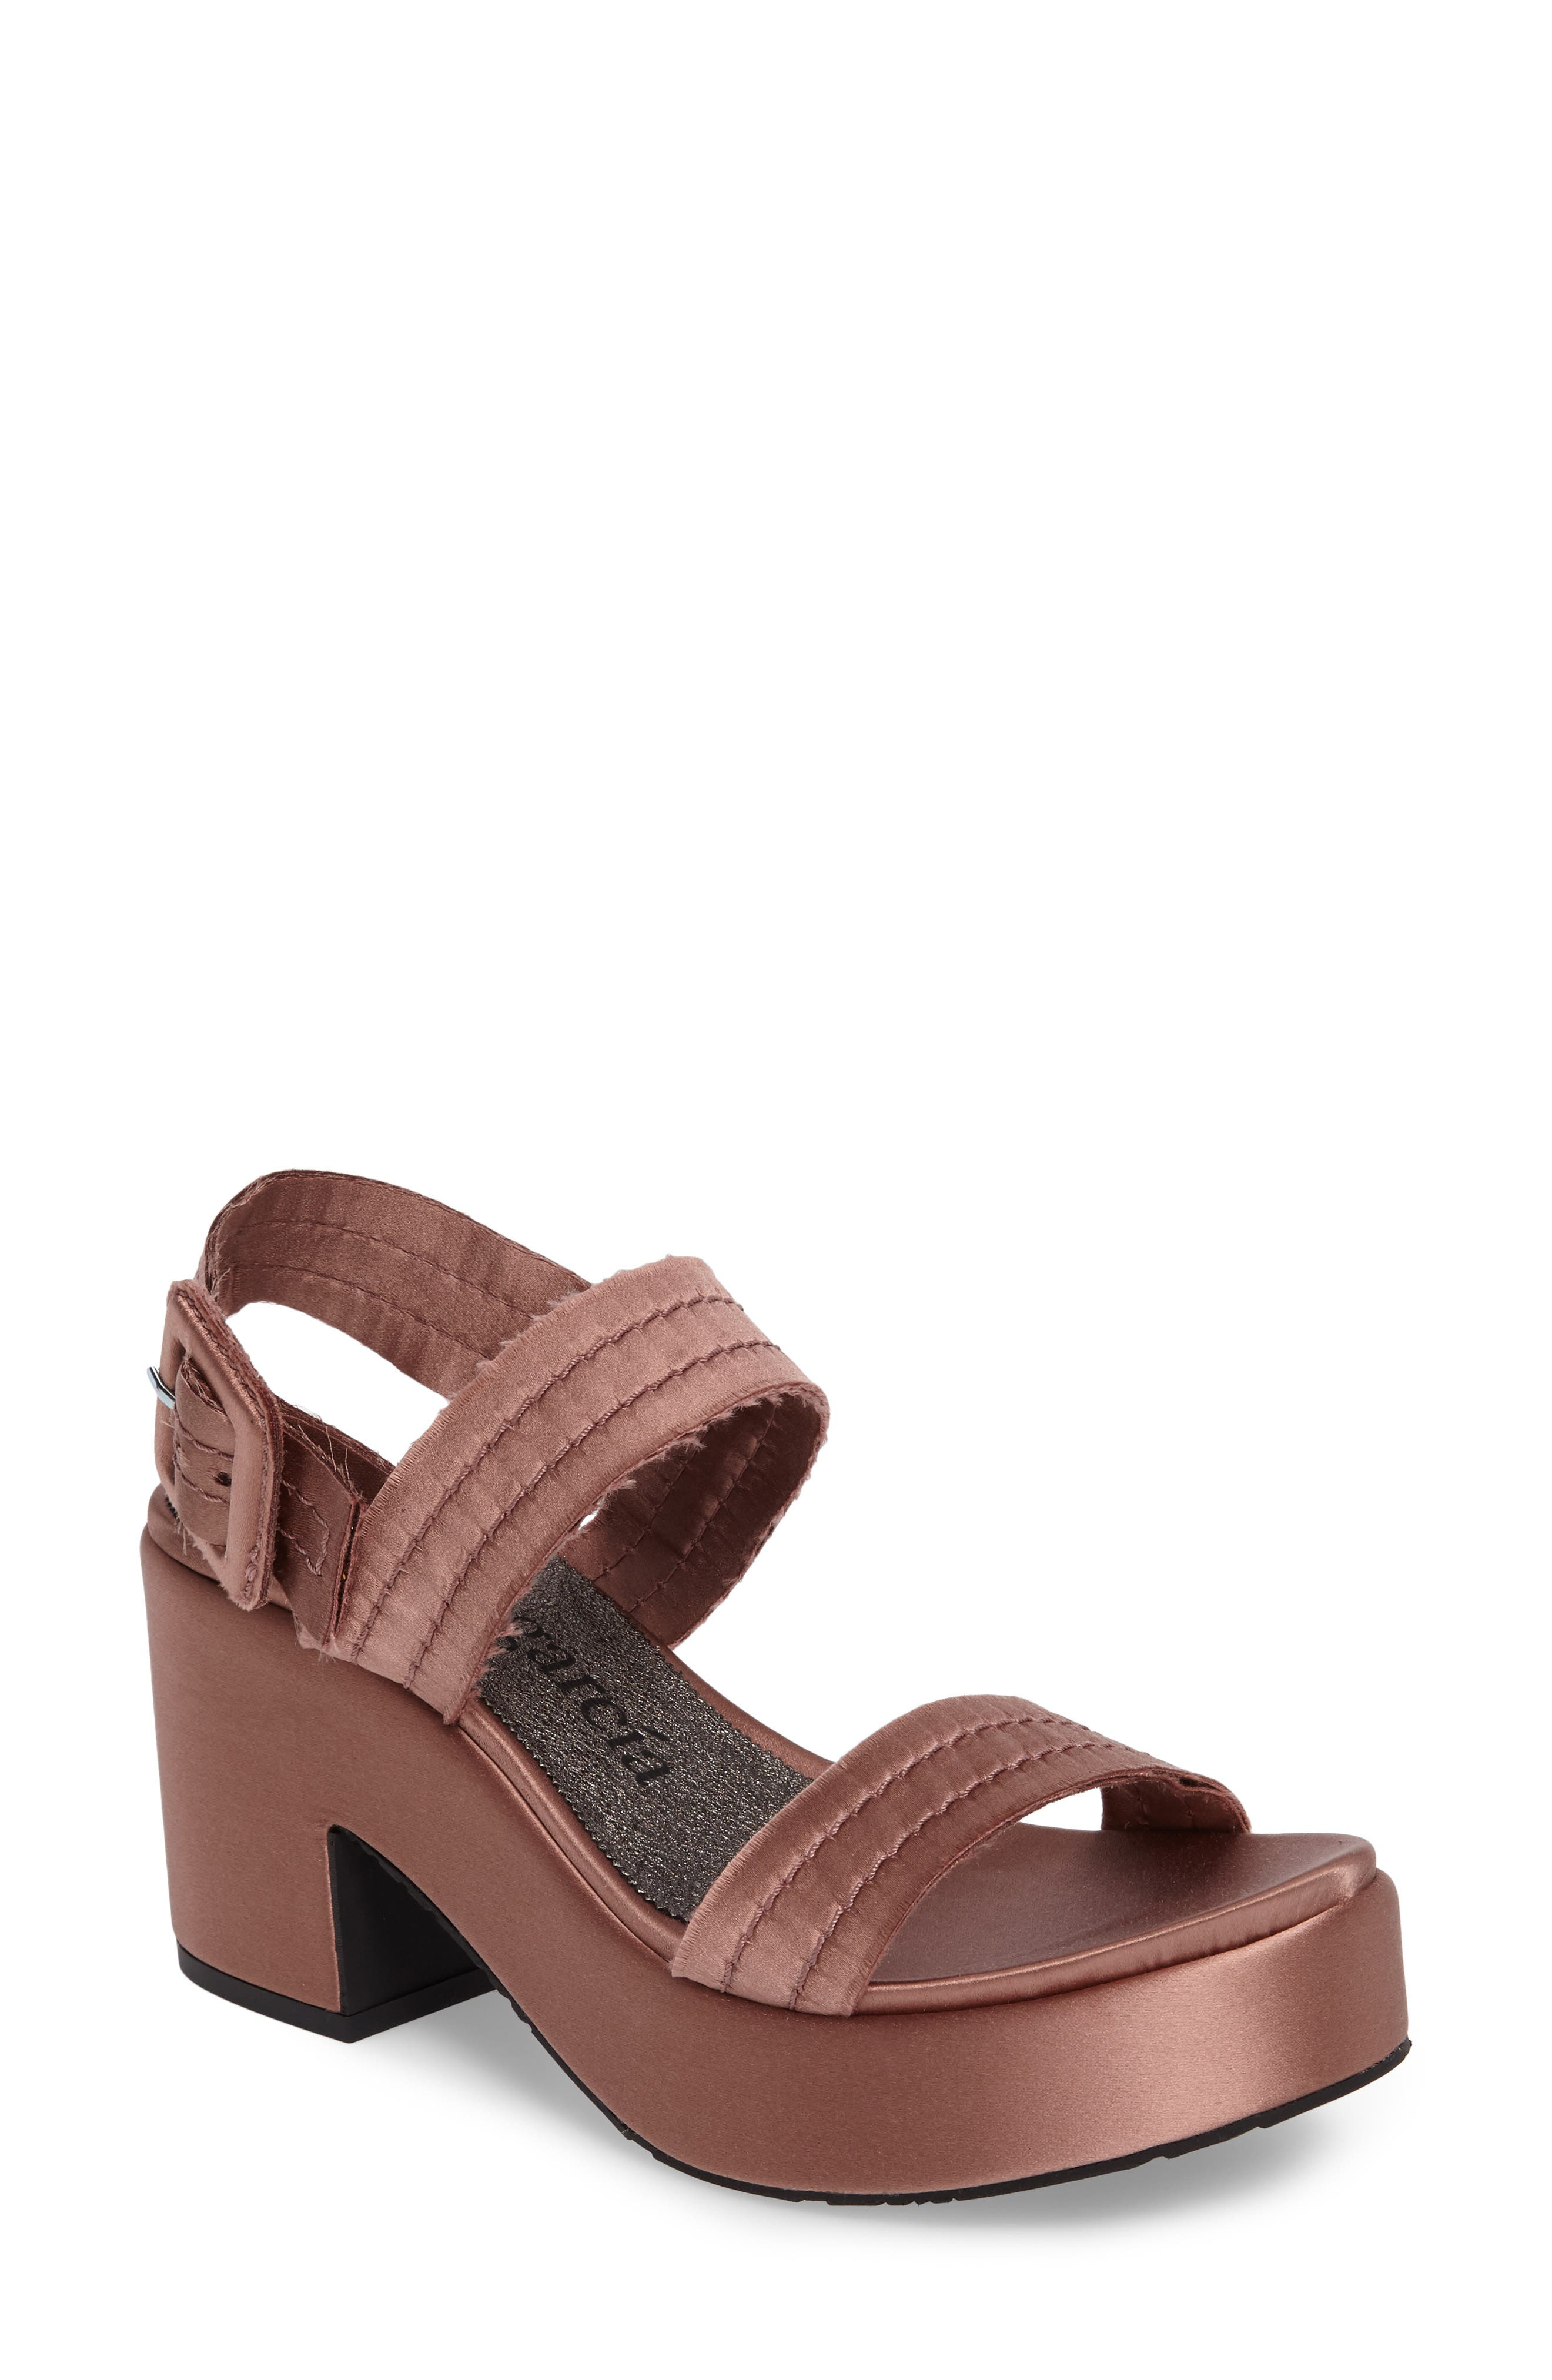 Decima Platform Sandal,                             Main thumbnail 1, color,                             Powder Satin